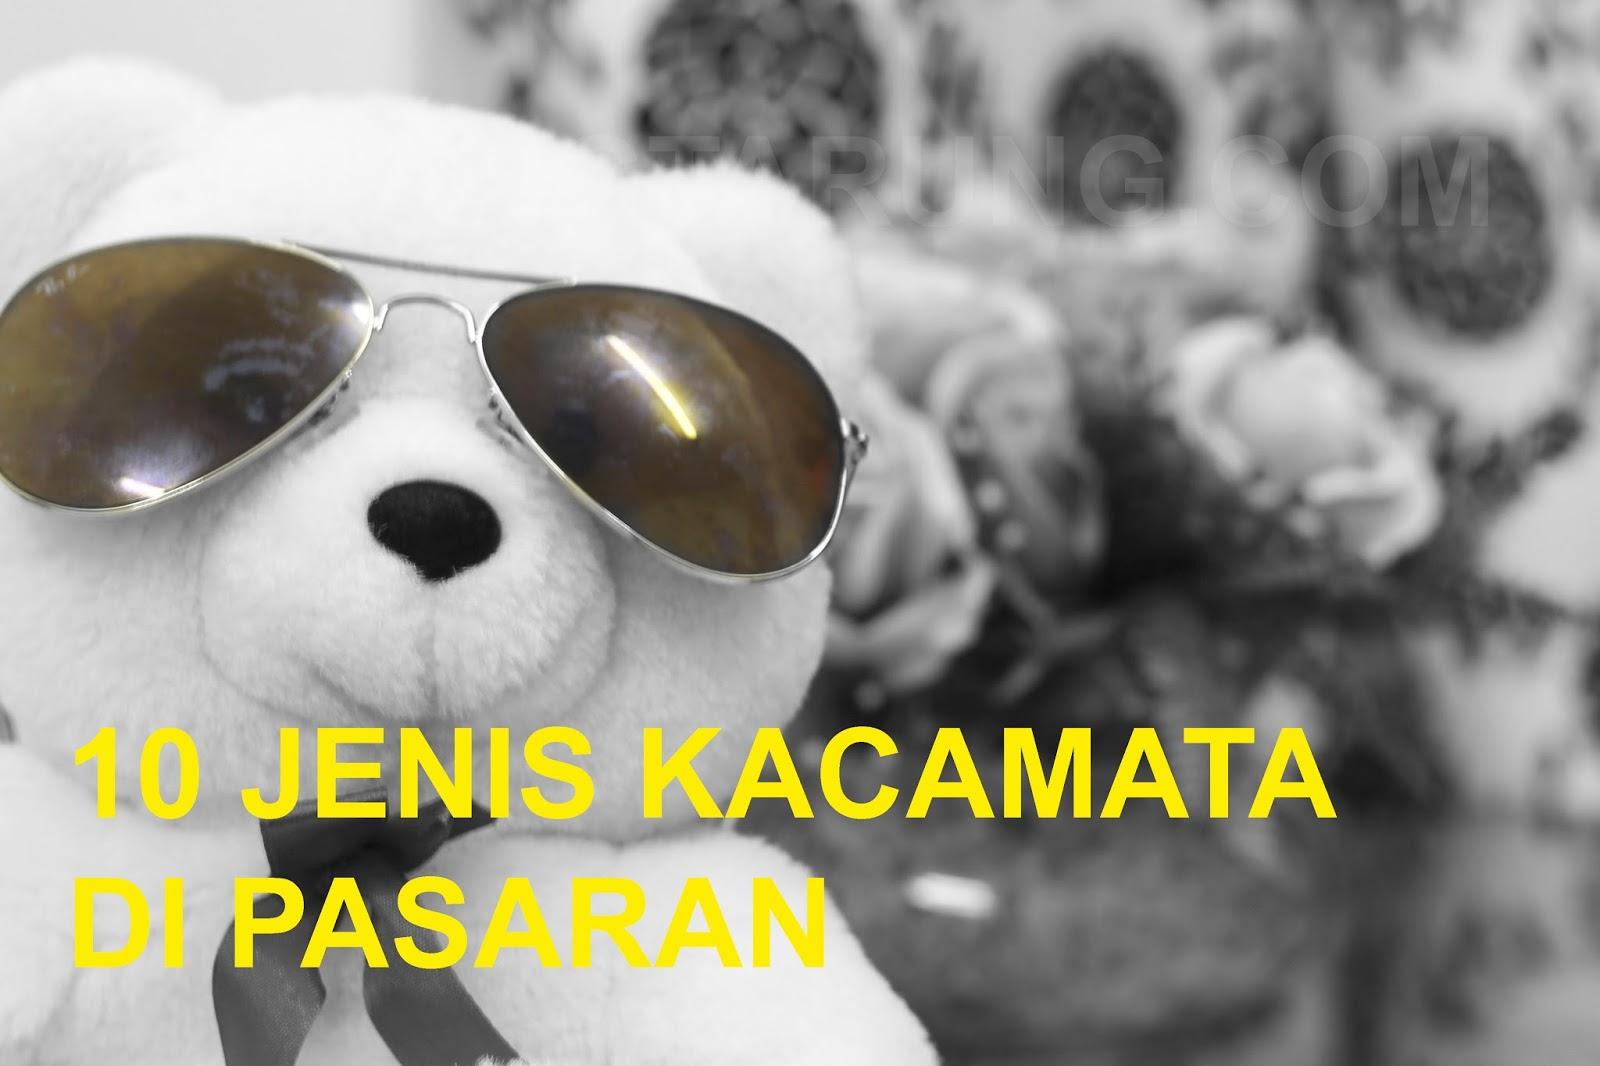 10 Jenis Kacamata (Shades) Popular Terdapat Di Pasaran - Travel ... a6d6f65e40